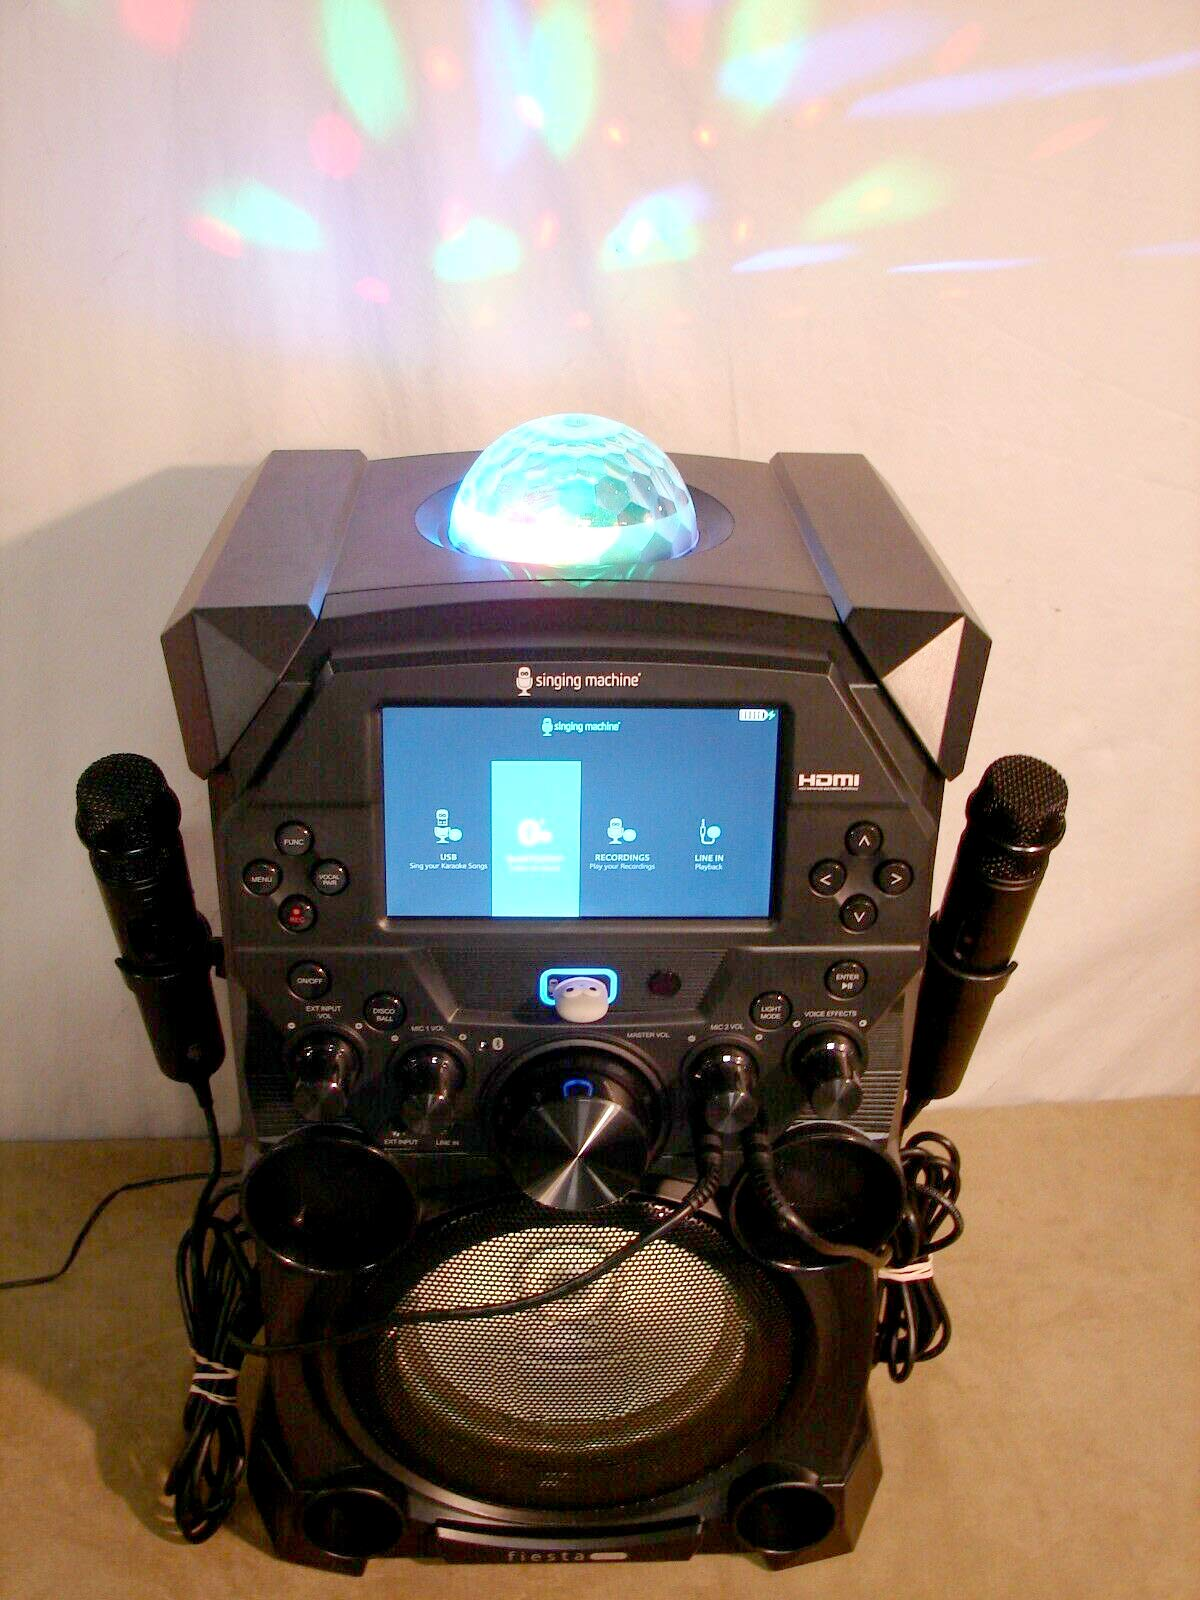 Amoldar 5inging Machine Fiest@ Voice Hi-Definition Karaoke System SDL9040 by Amoldar (Image #6)